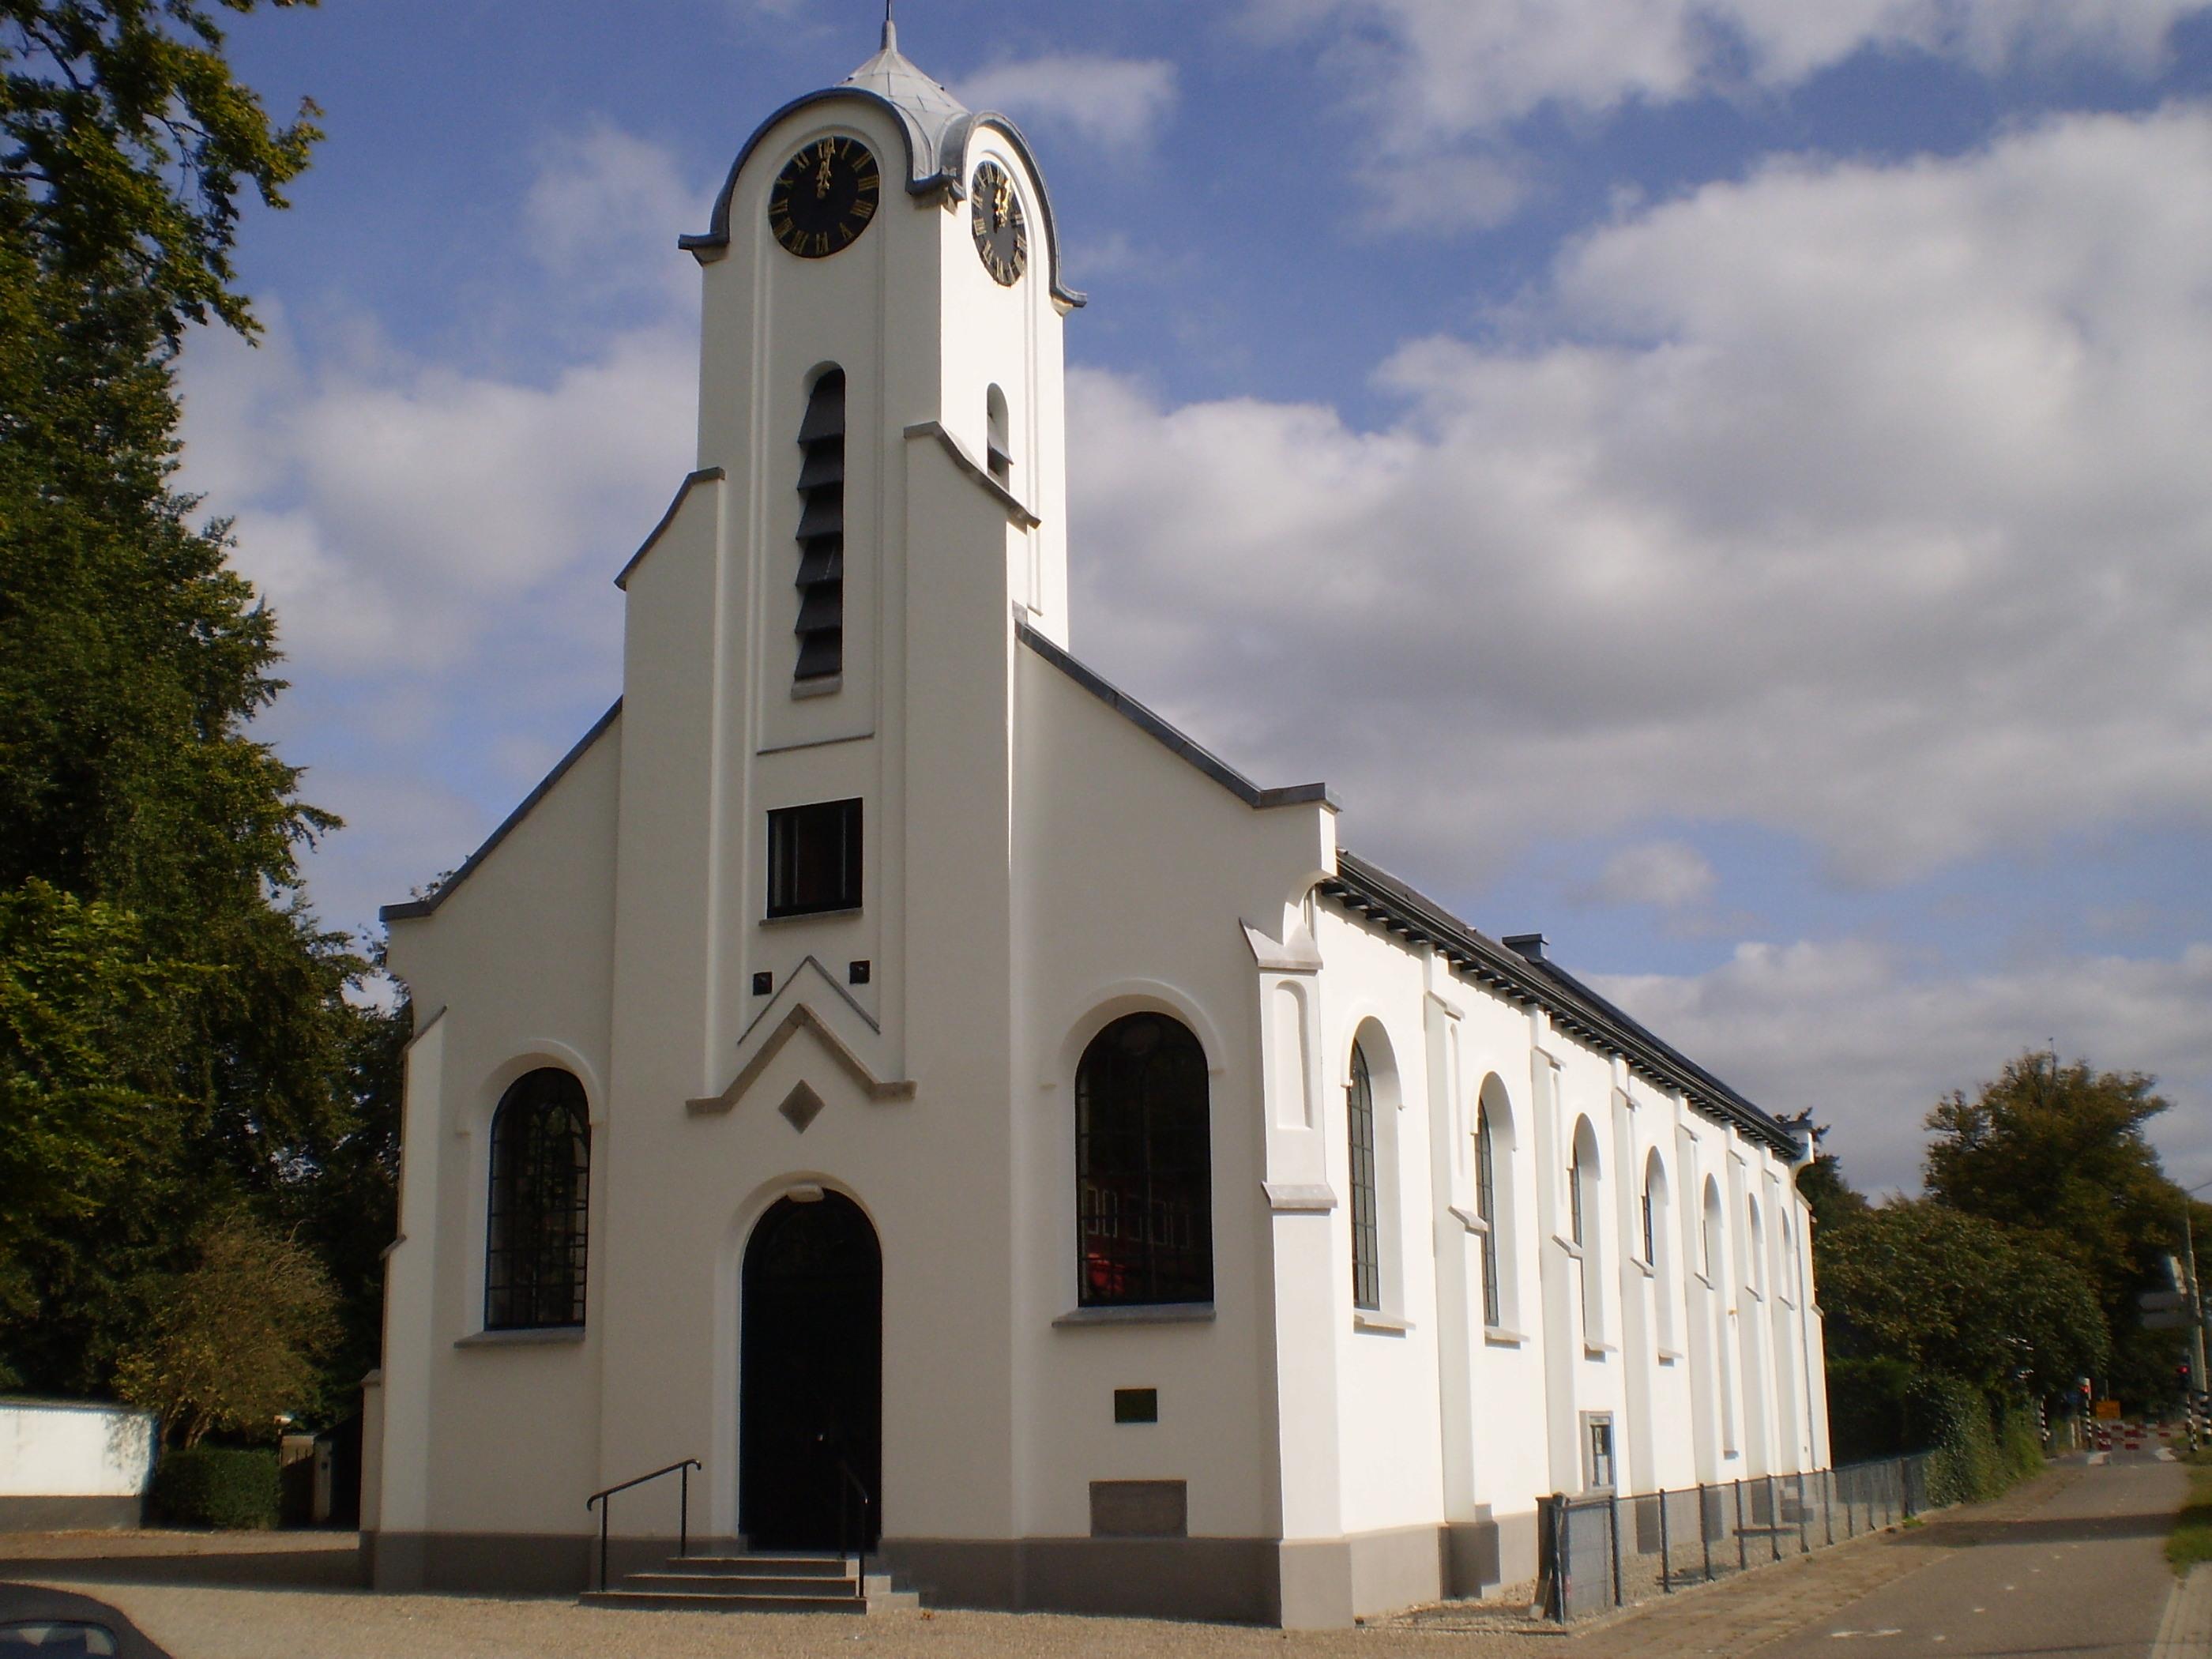 Witte Kerkje (Huis ter Heide)